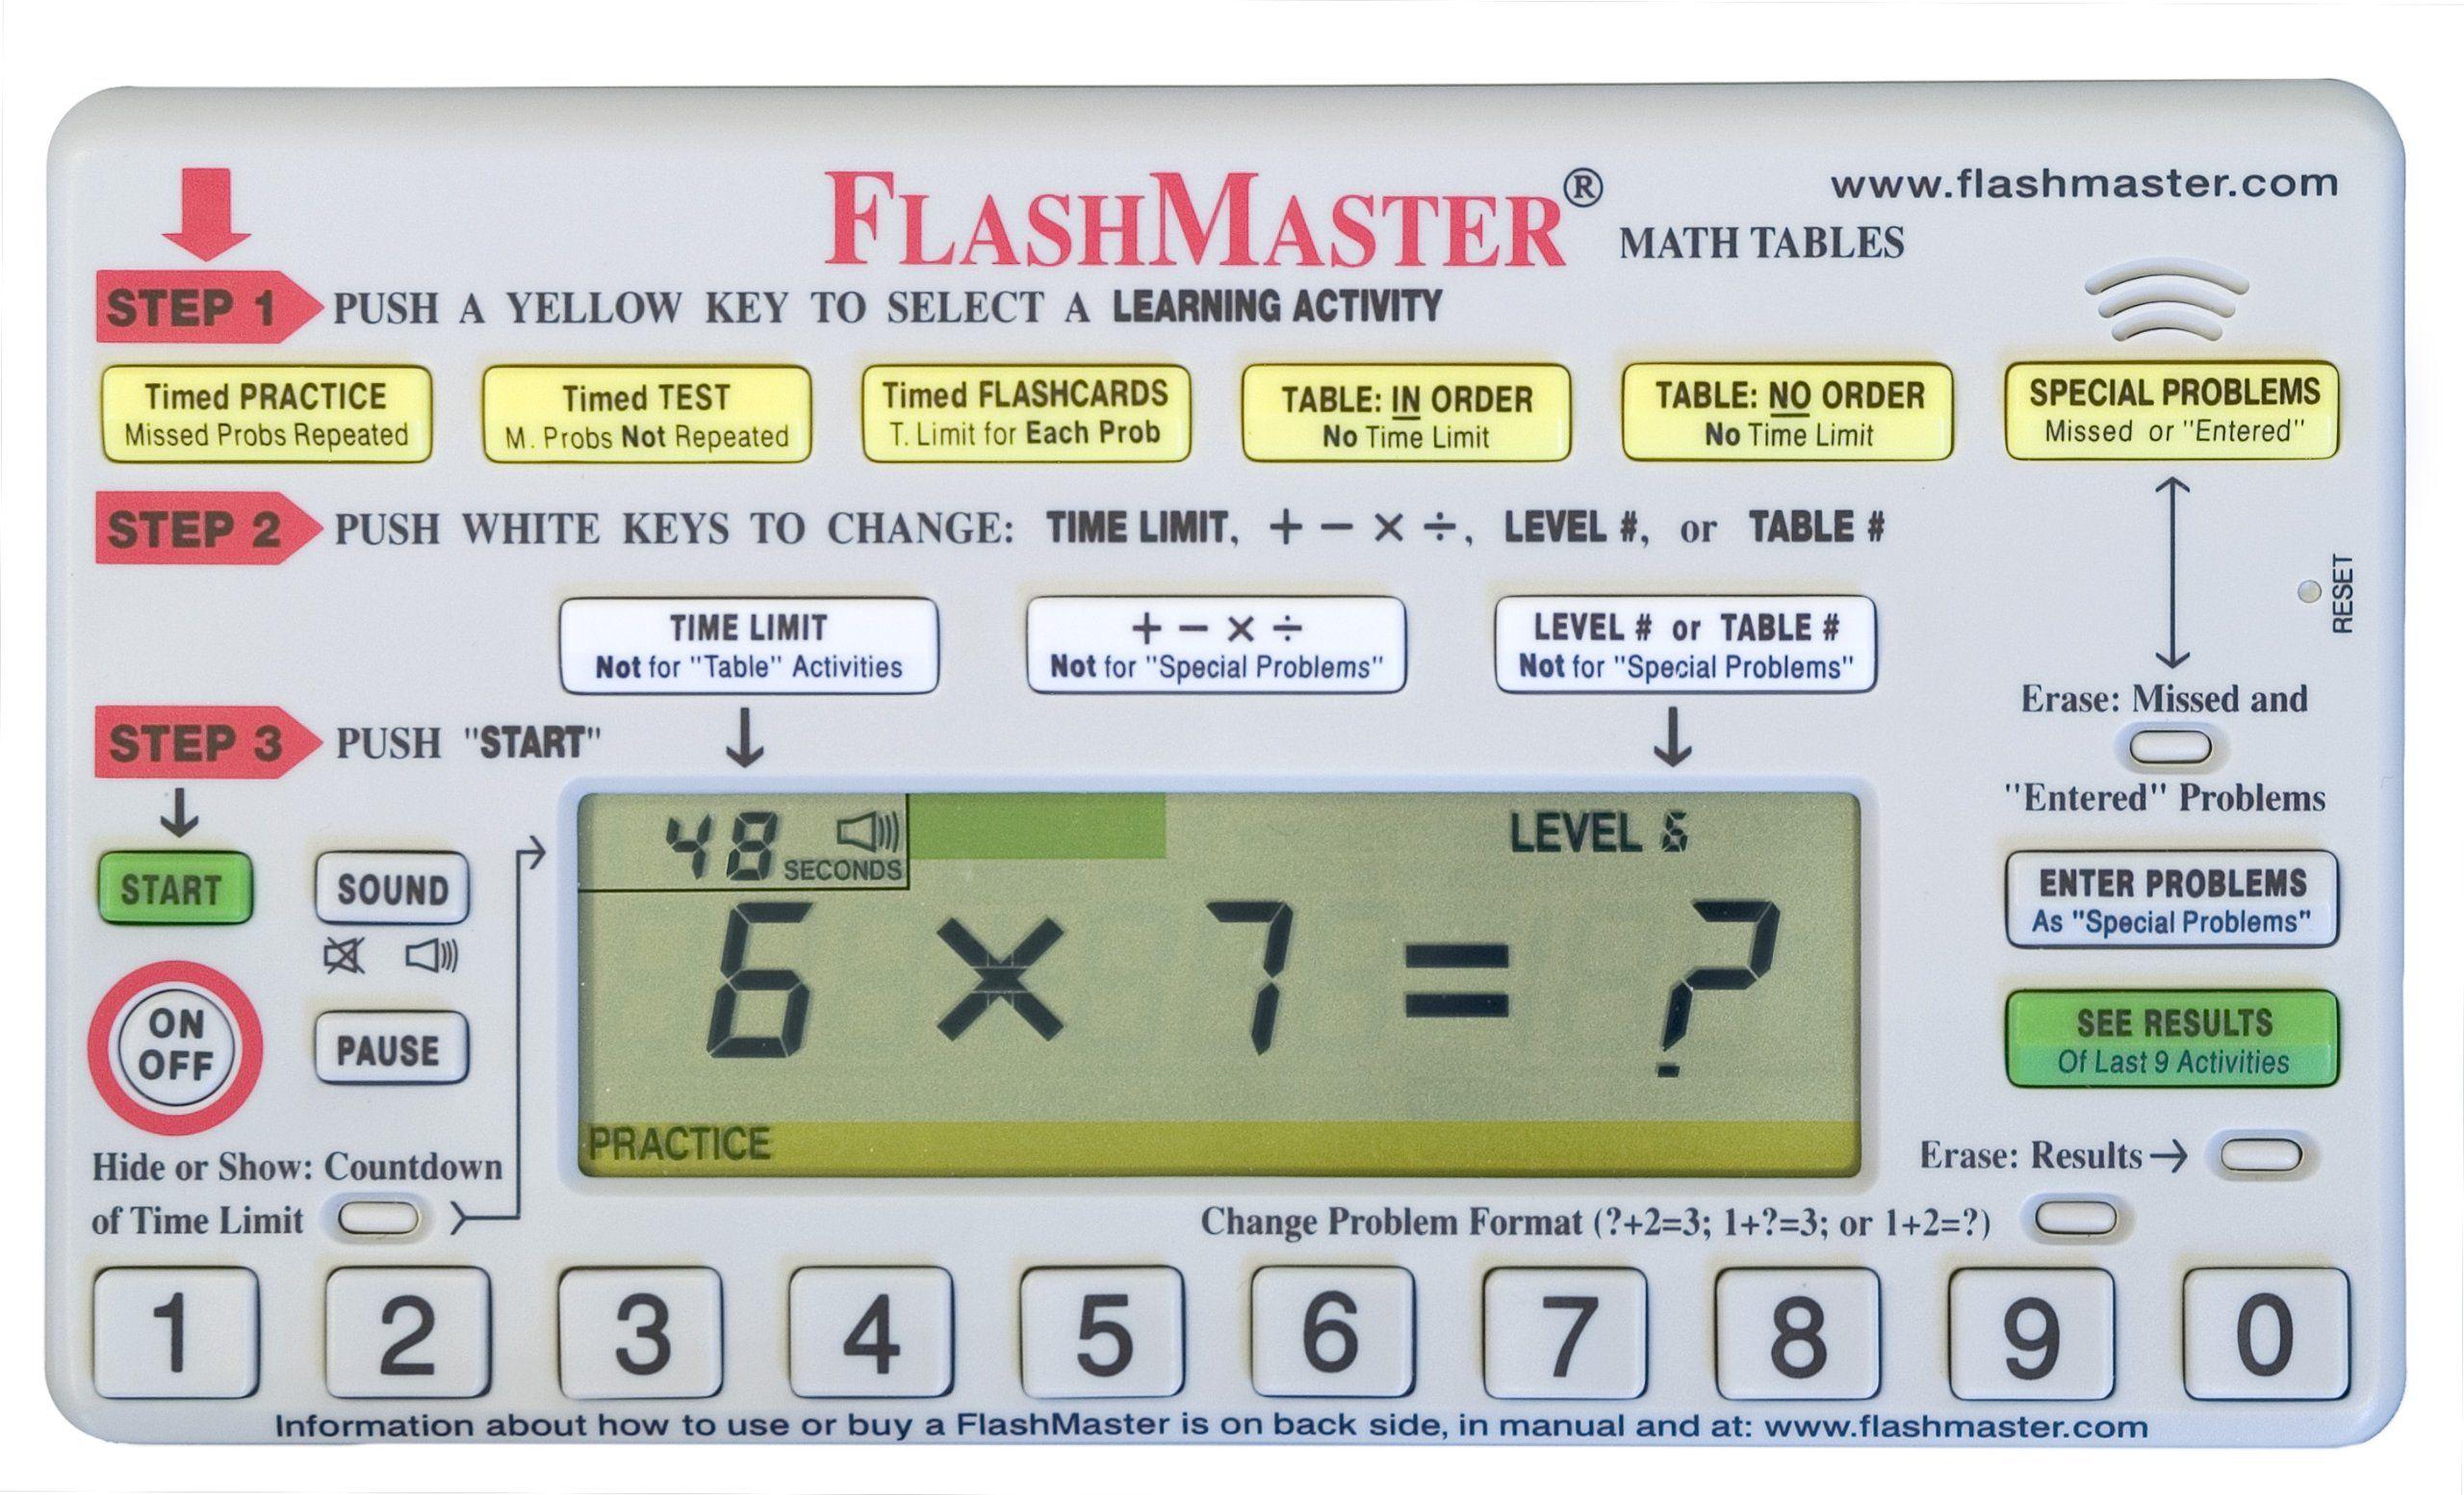 Amazon: Flashmaster: Handheld Computer For Mastering